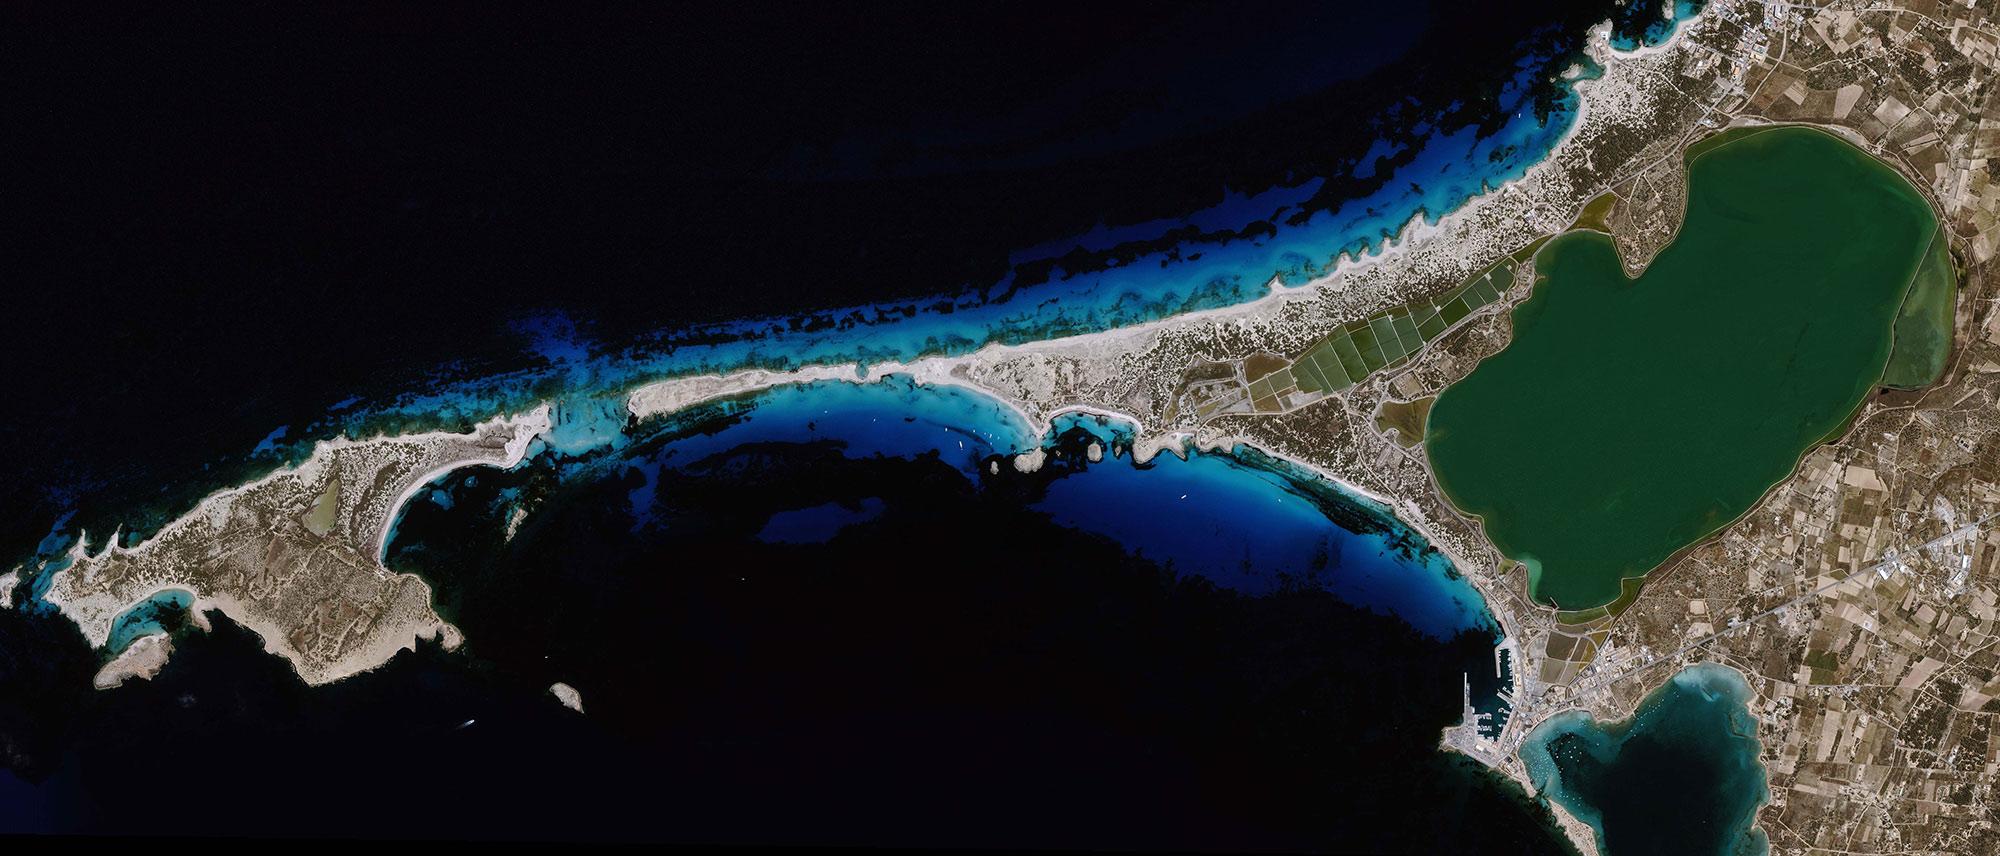 Satellite data analysis imagery images